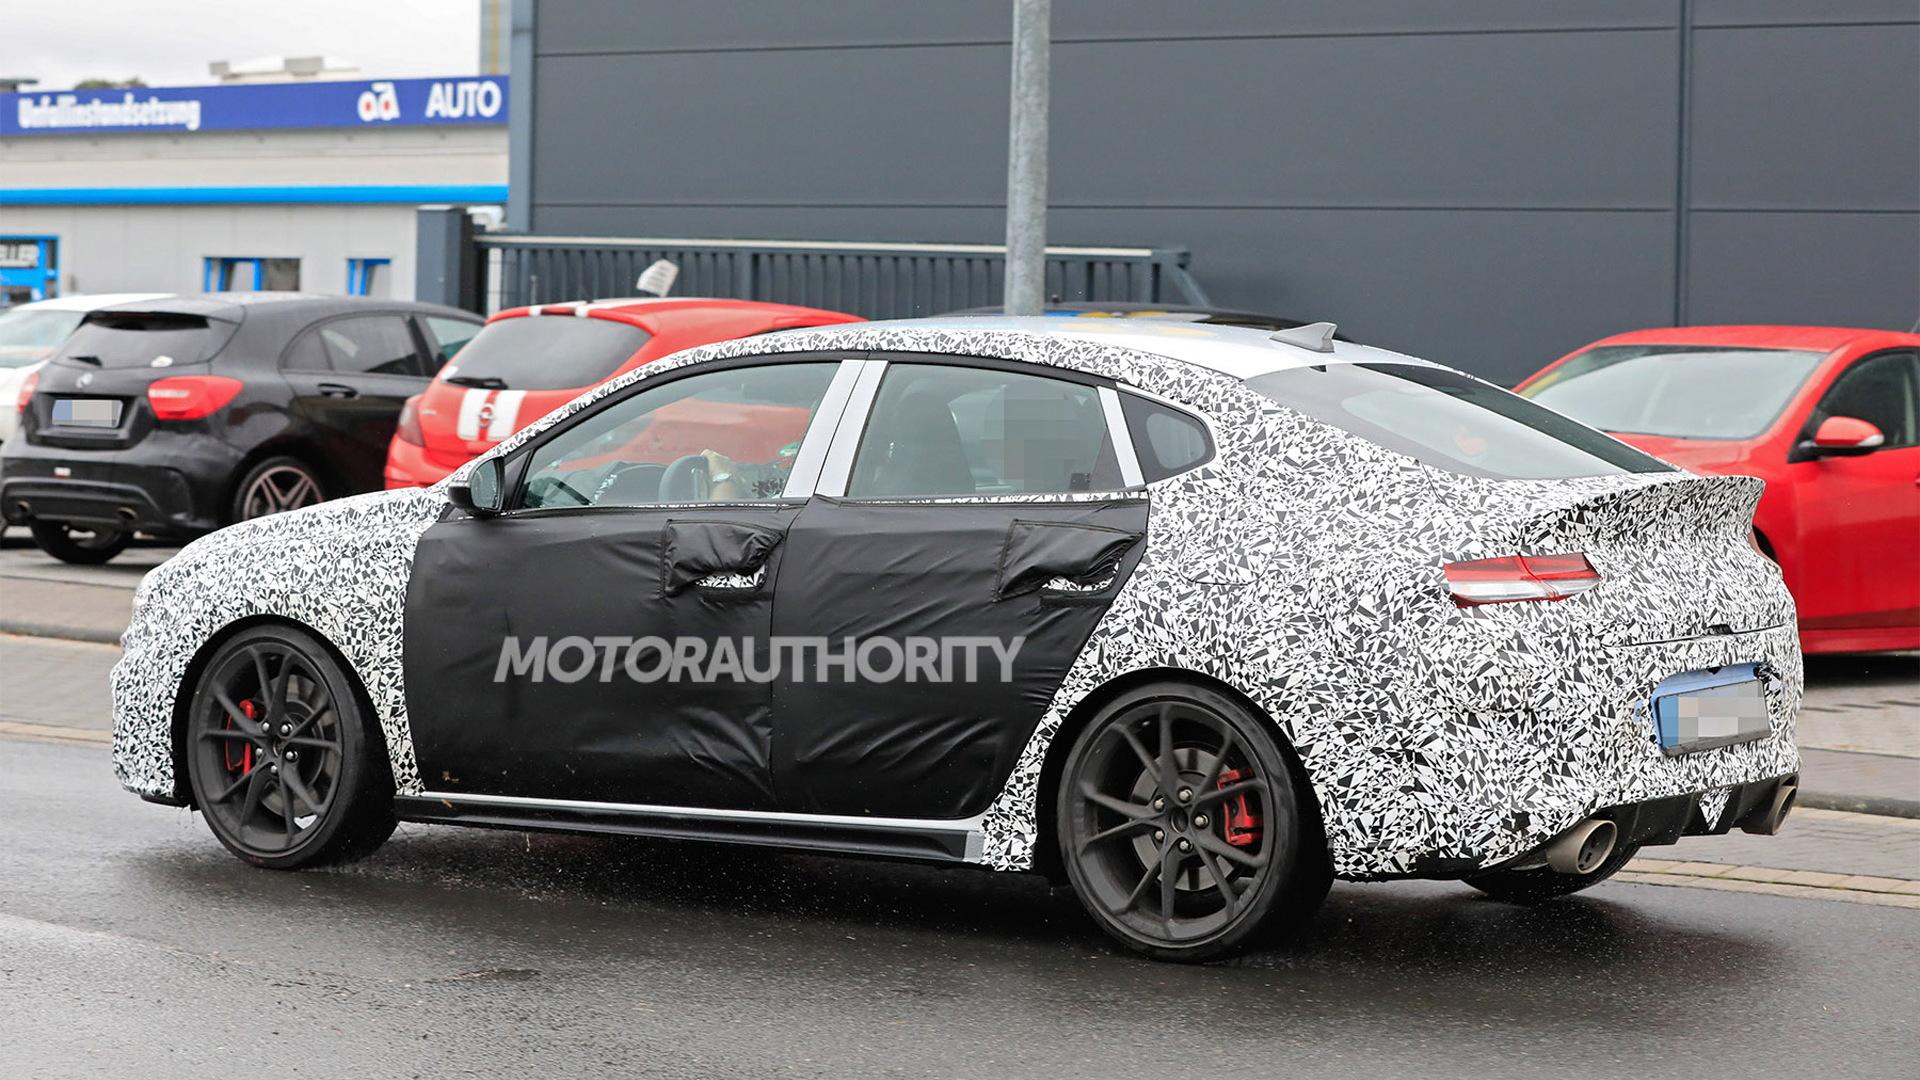 2021 Hyundai i30 Fastback N facelift spy shots - Photo credit: S. Baldauf/SB-Medien